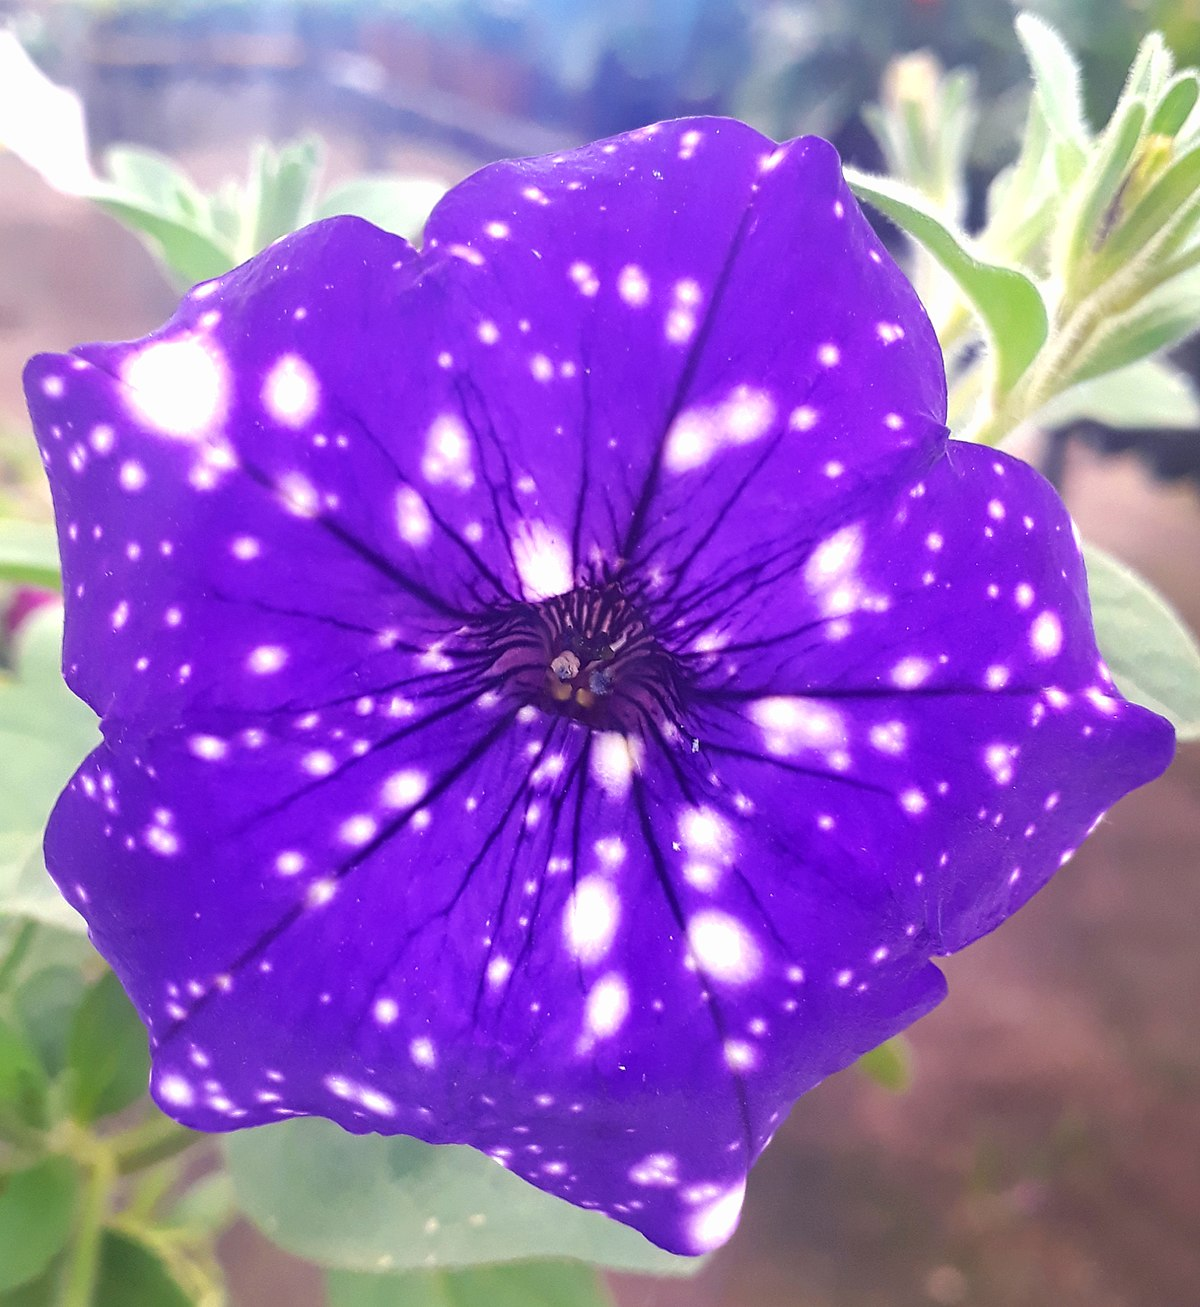 Starry night petunia flower in Porto Alegre - Brazil.jpg